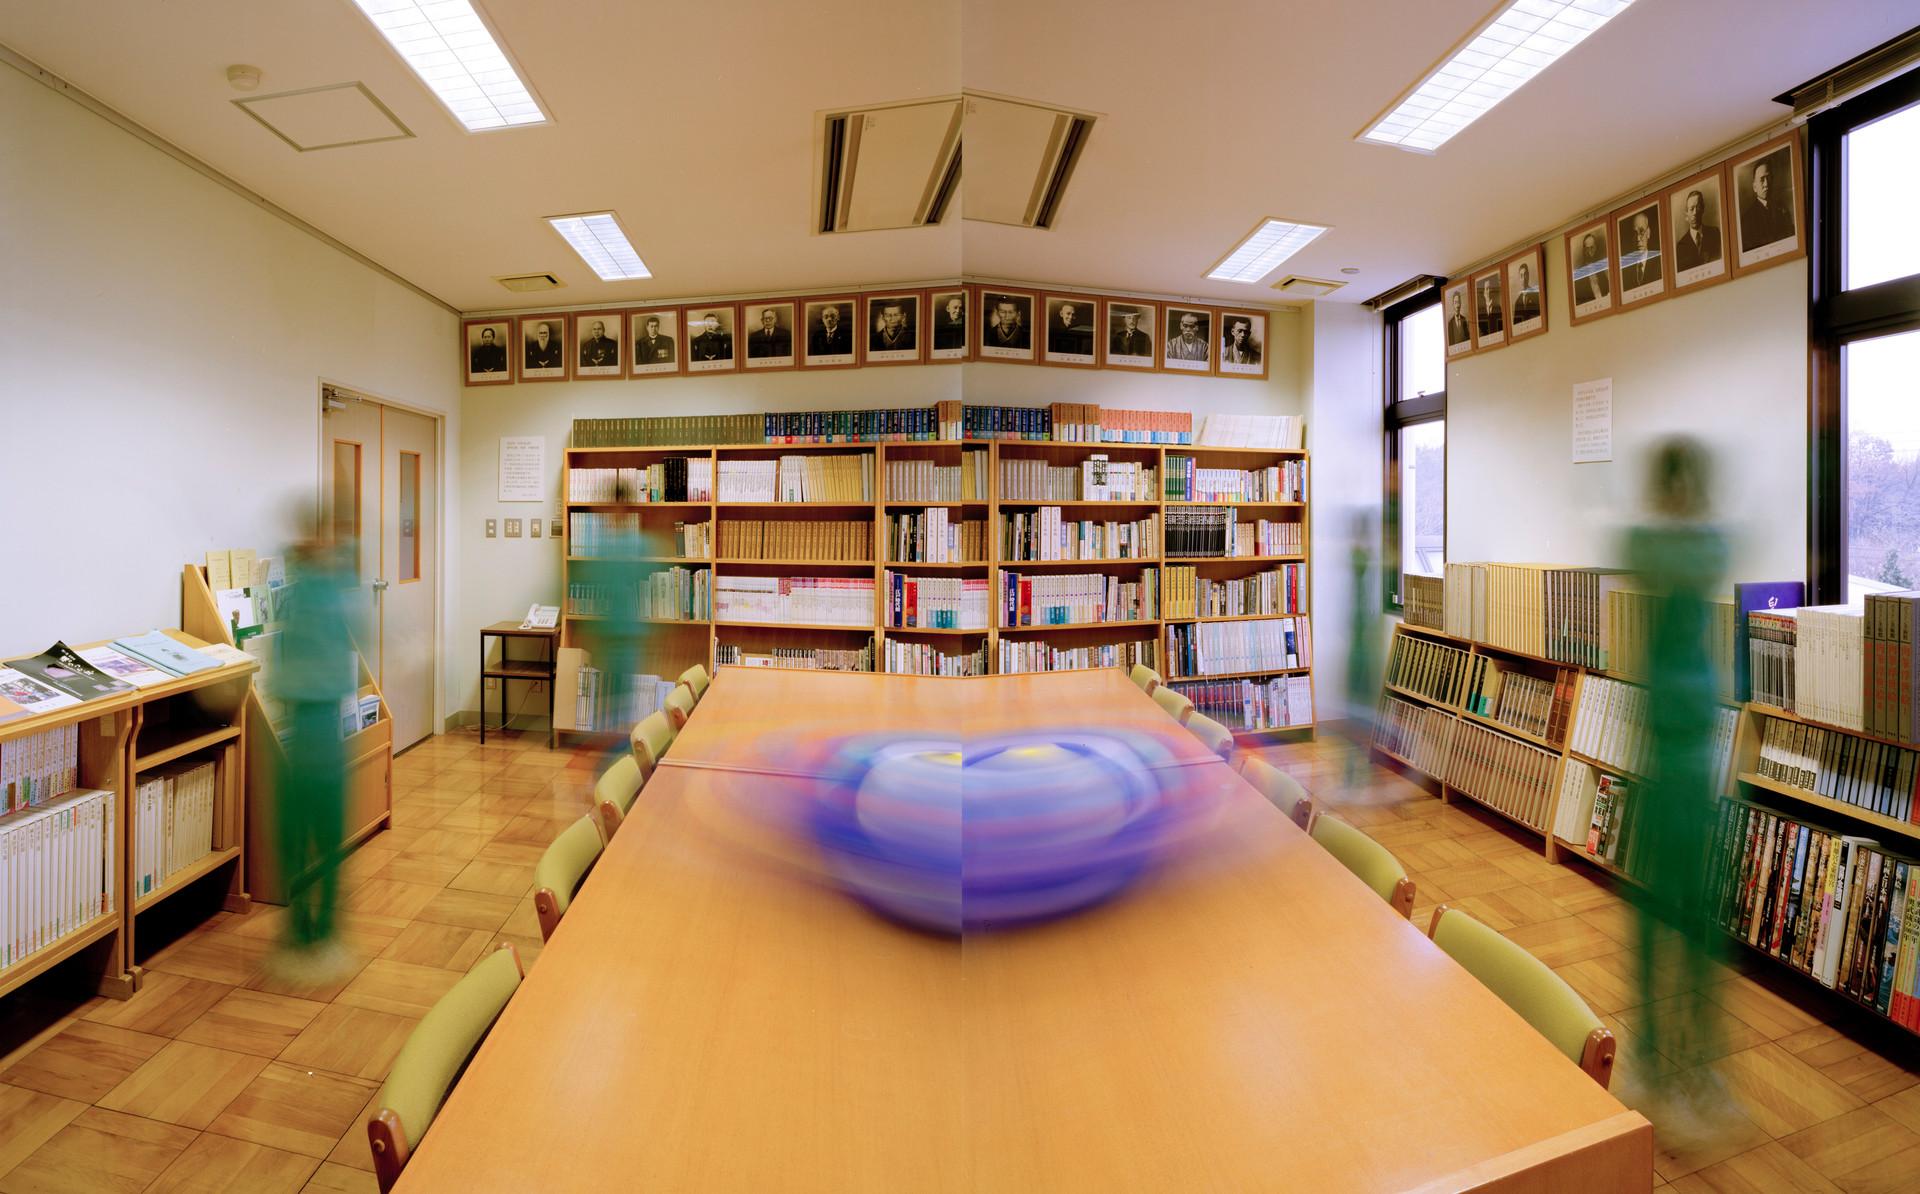 Moroyama History & Folk Museum Saitama